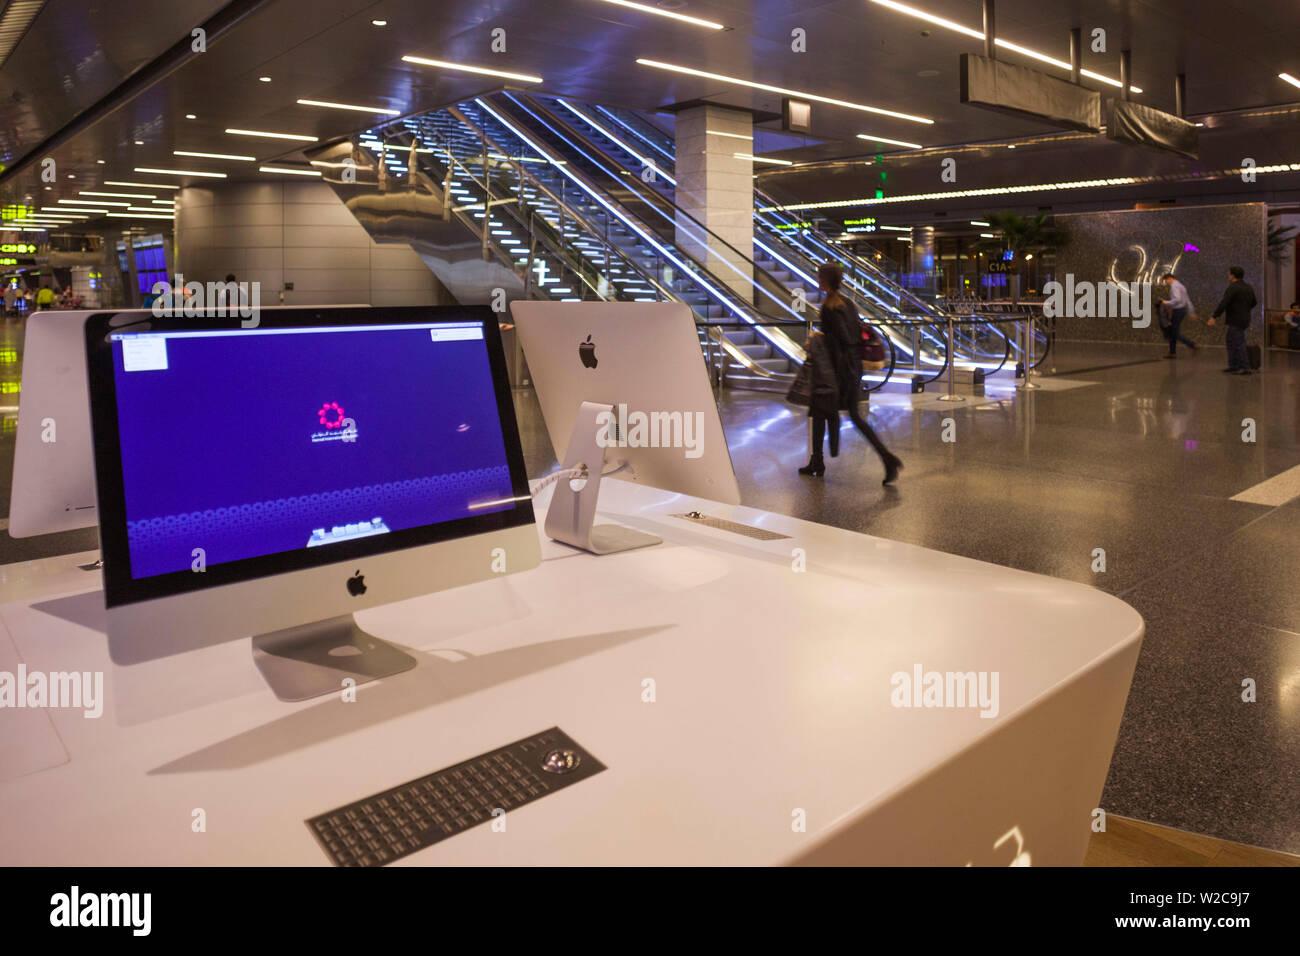 Qatar, Doha, Doha-Hamad Aéroport International, ouvert depuis 2014, l'espace informatique internet Banque D'Images